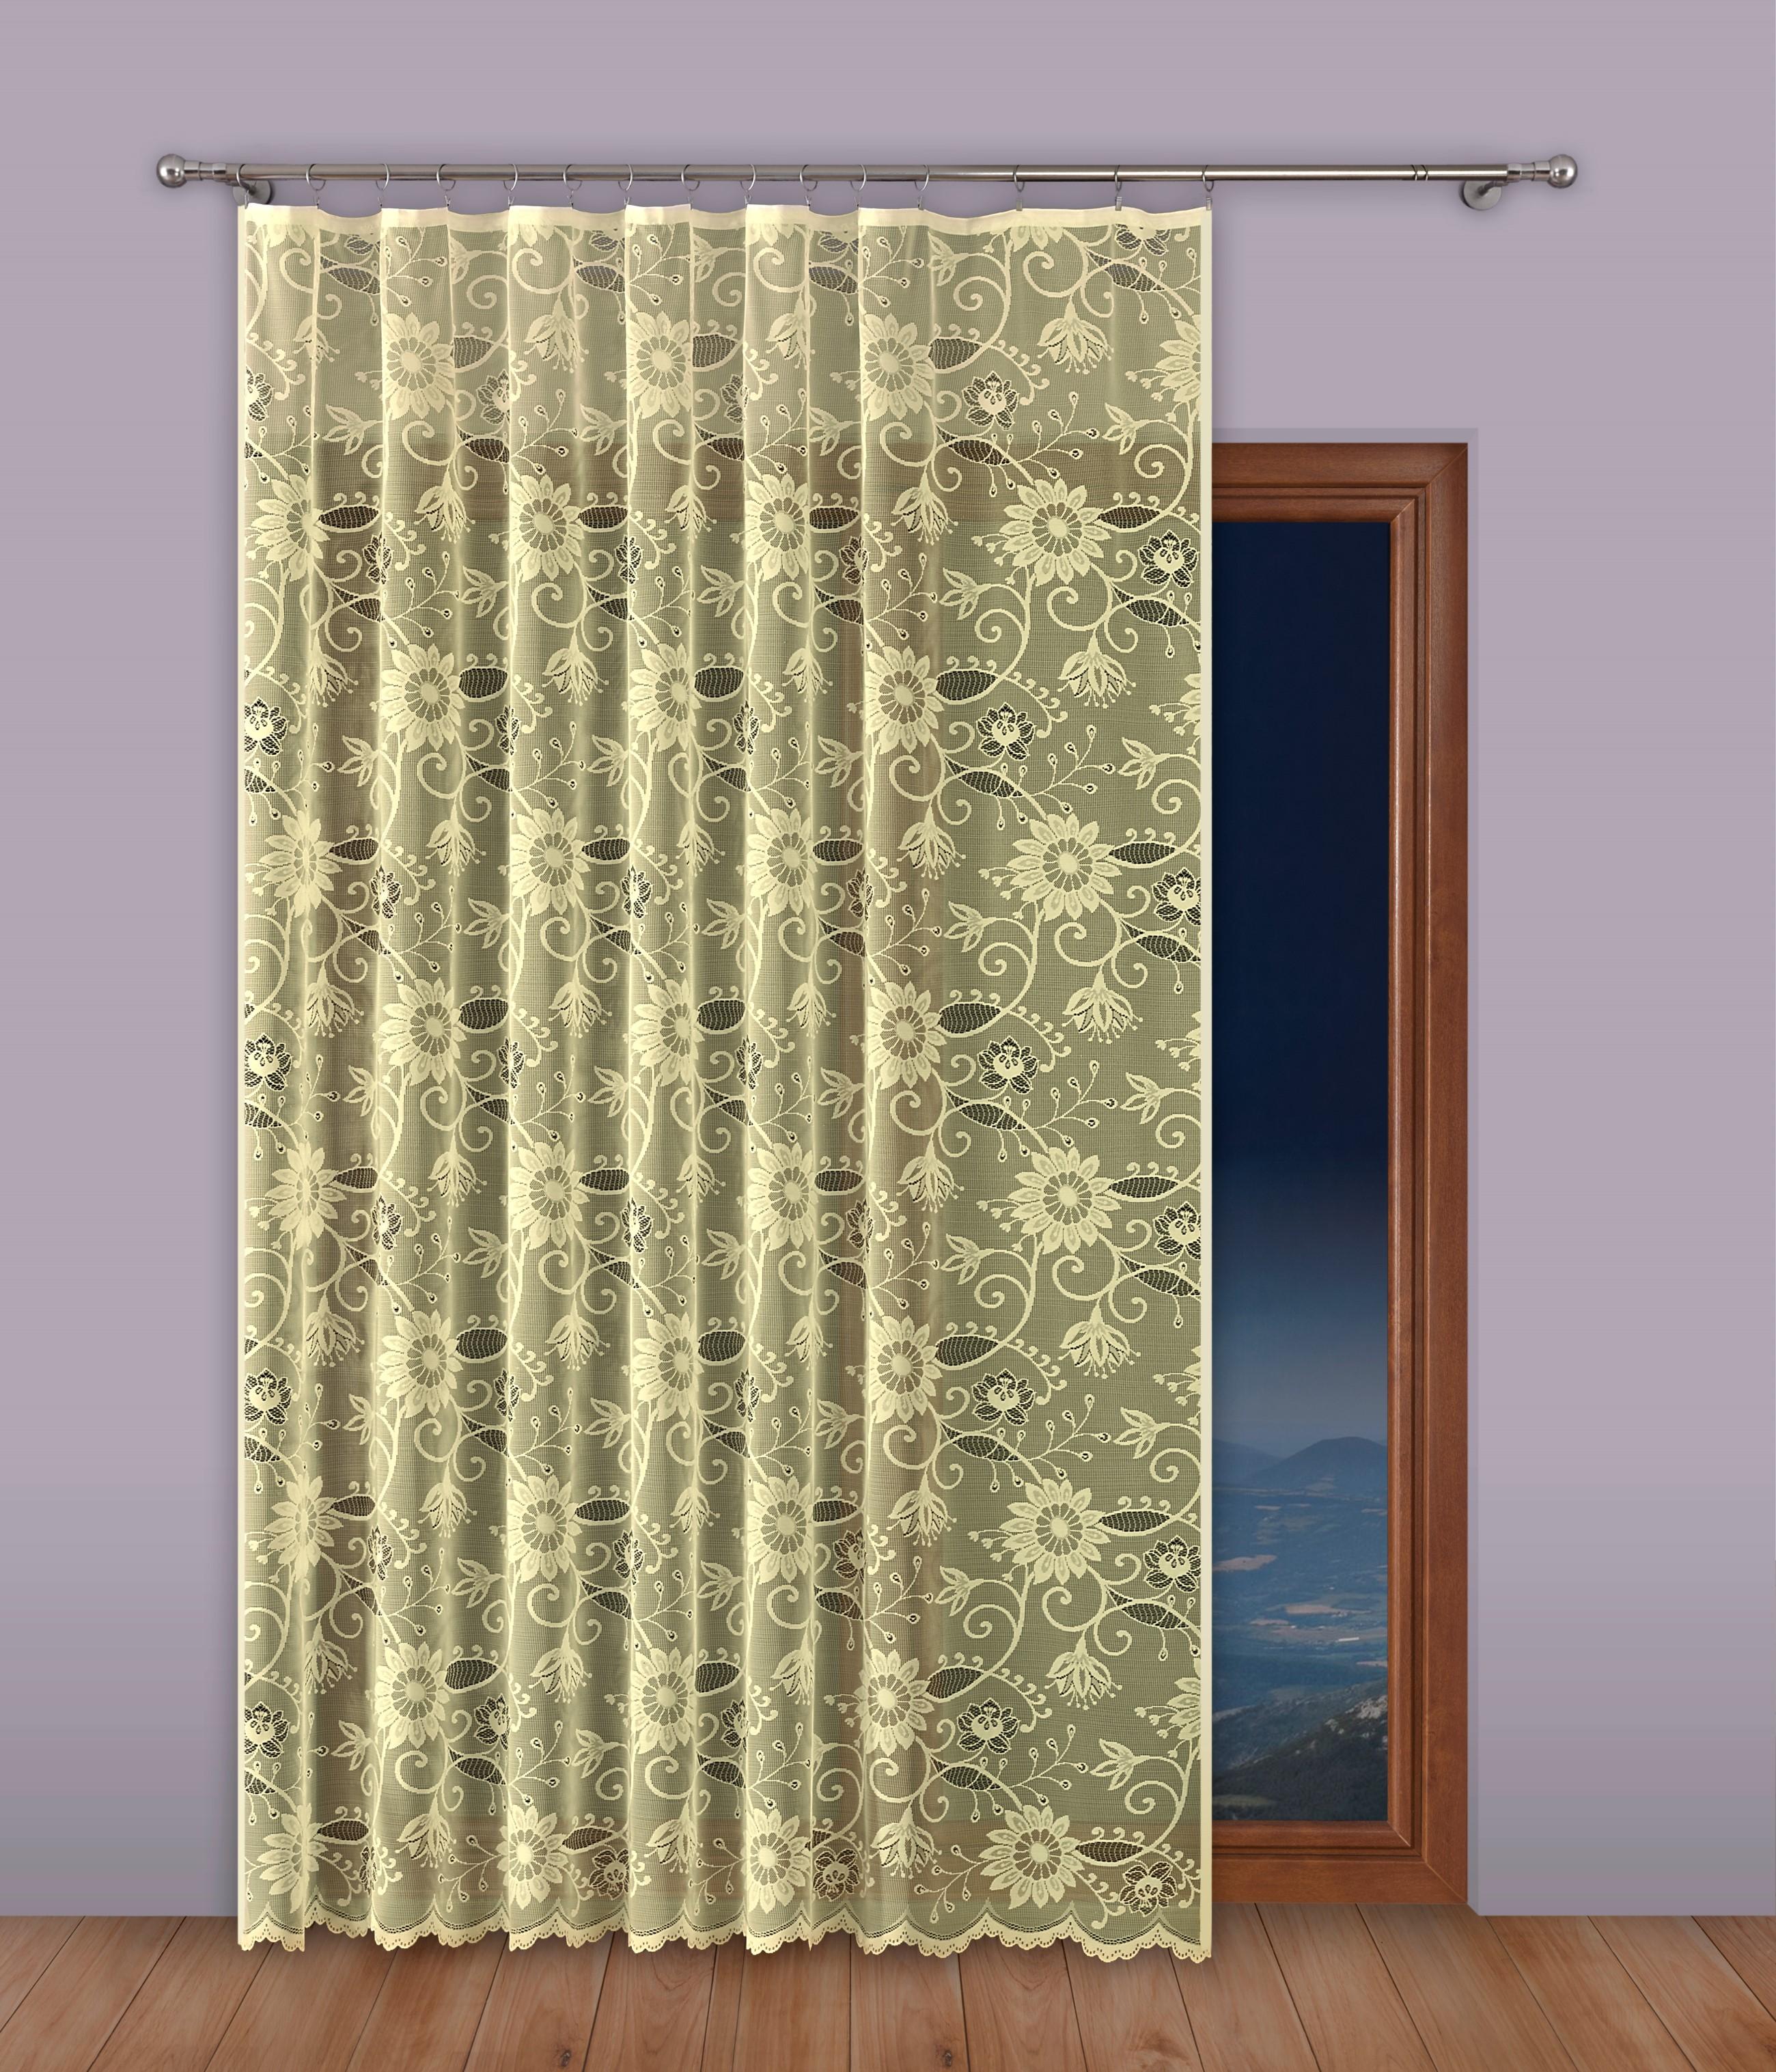 Шторы Primavera Классические шторы Beelzebub Цвет: Кремовый шторы kauffort классические шторы barolo